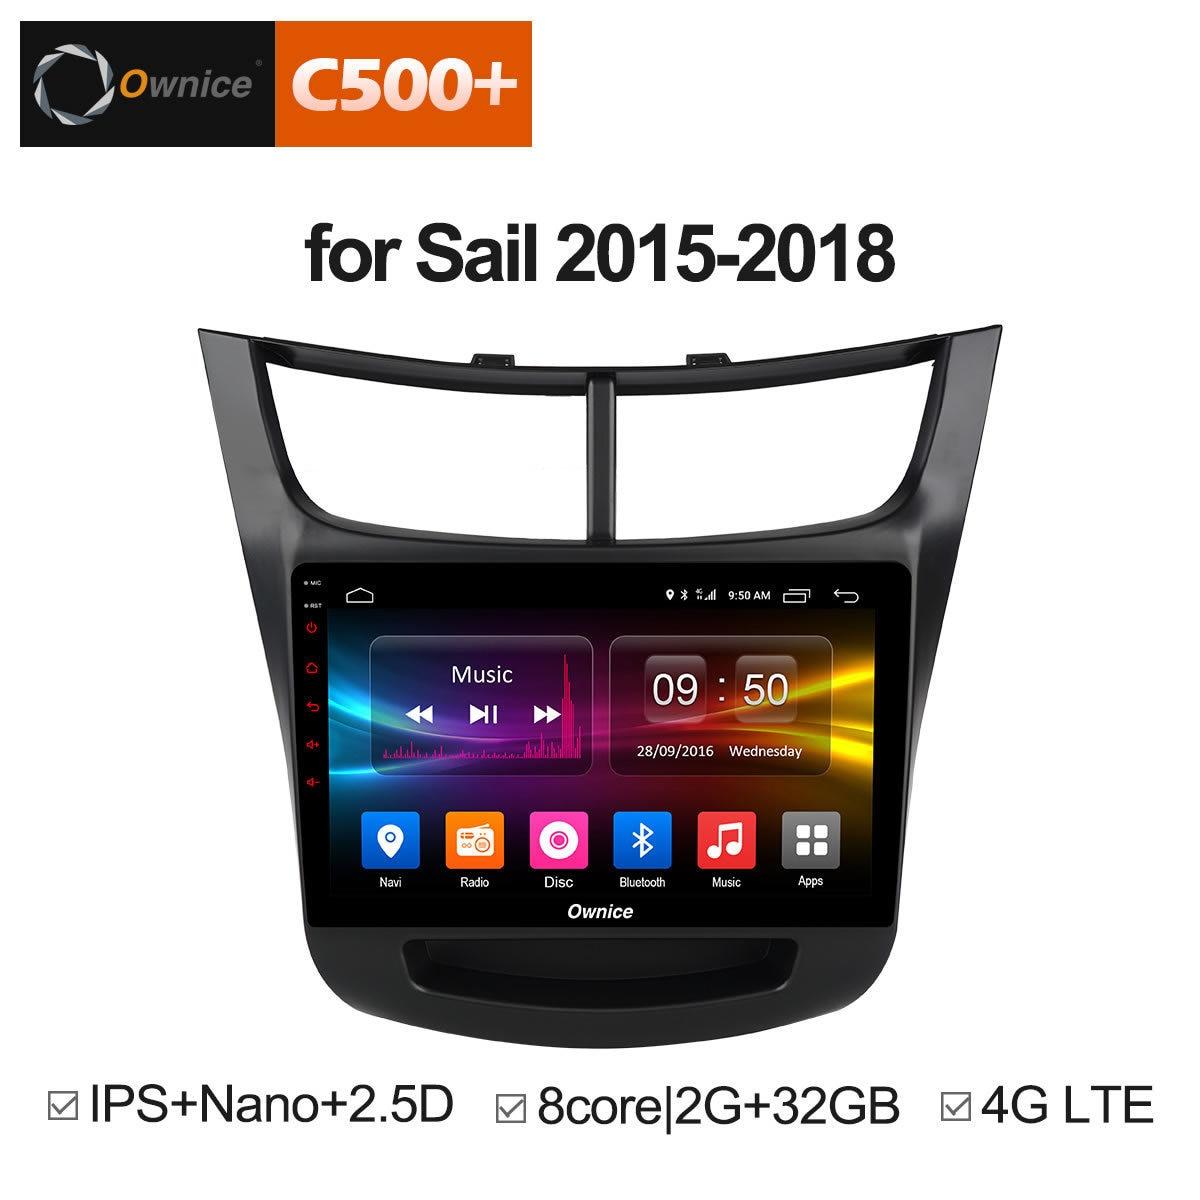 Ownice 9 pouces multimédia OEM Fe voiture PC Android 8.1 véhicule GPS Radio Navigation pour Chevrolet Sail 2015 2016 2017 2018 BT 4G DAB